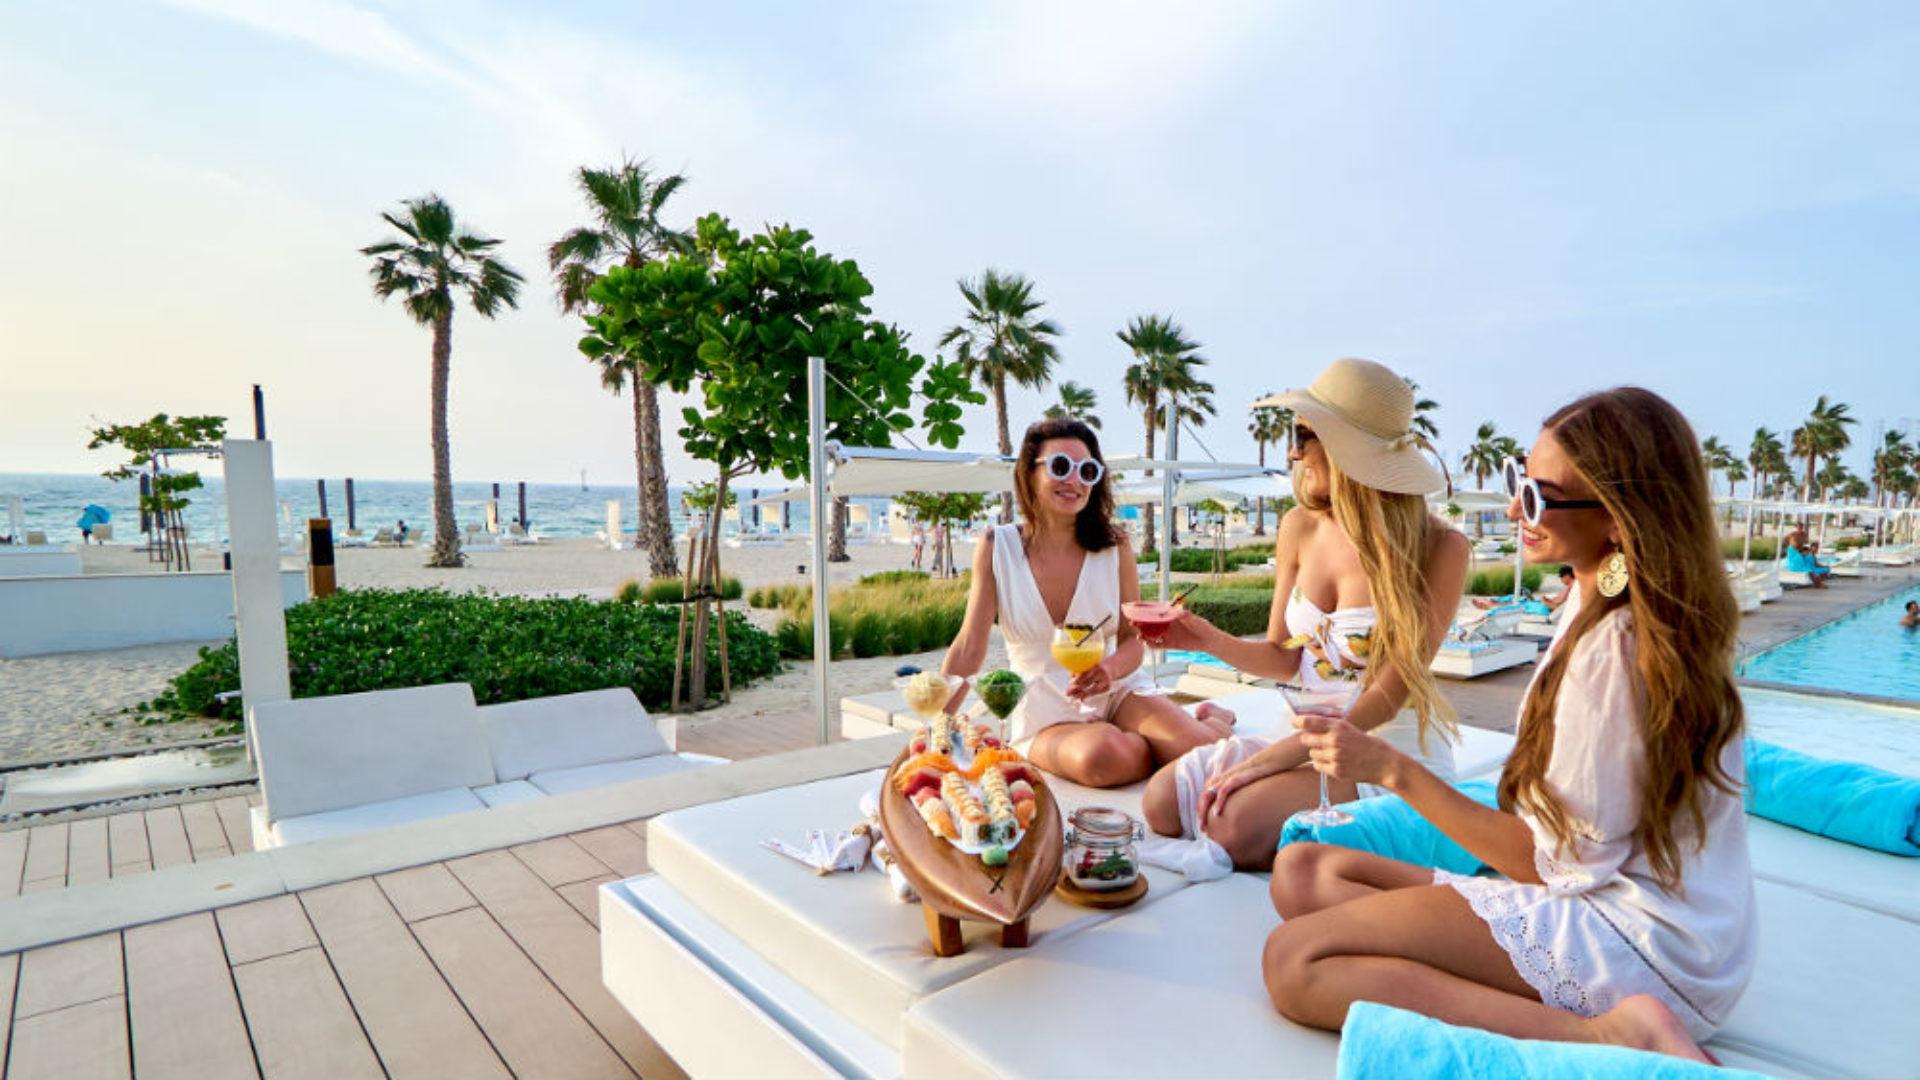 Girlfriends on a sun lounge at Nikki Beach Resort & Spa